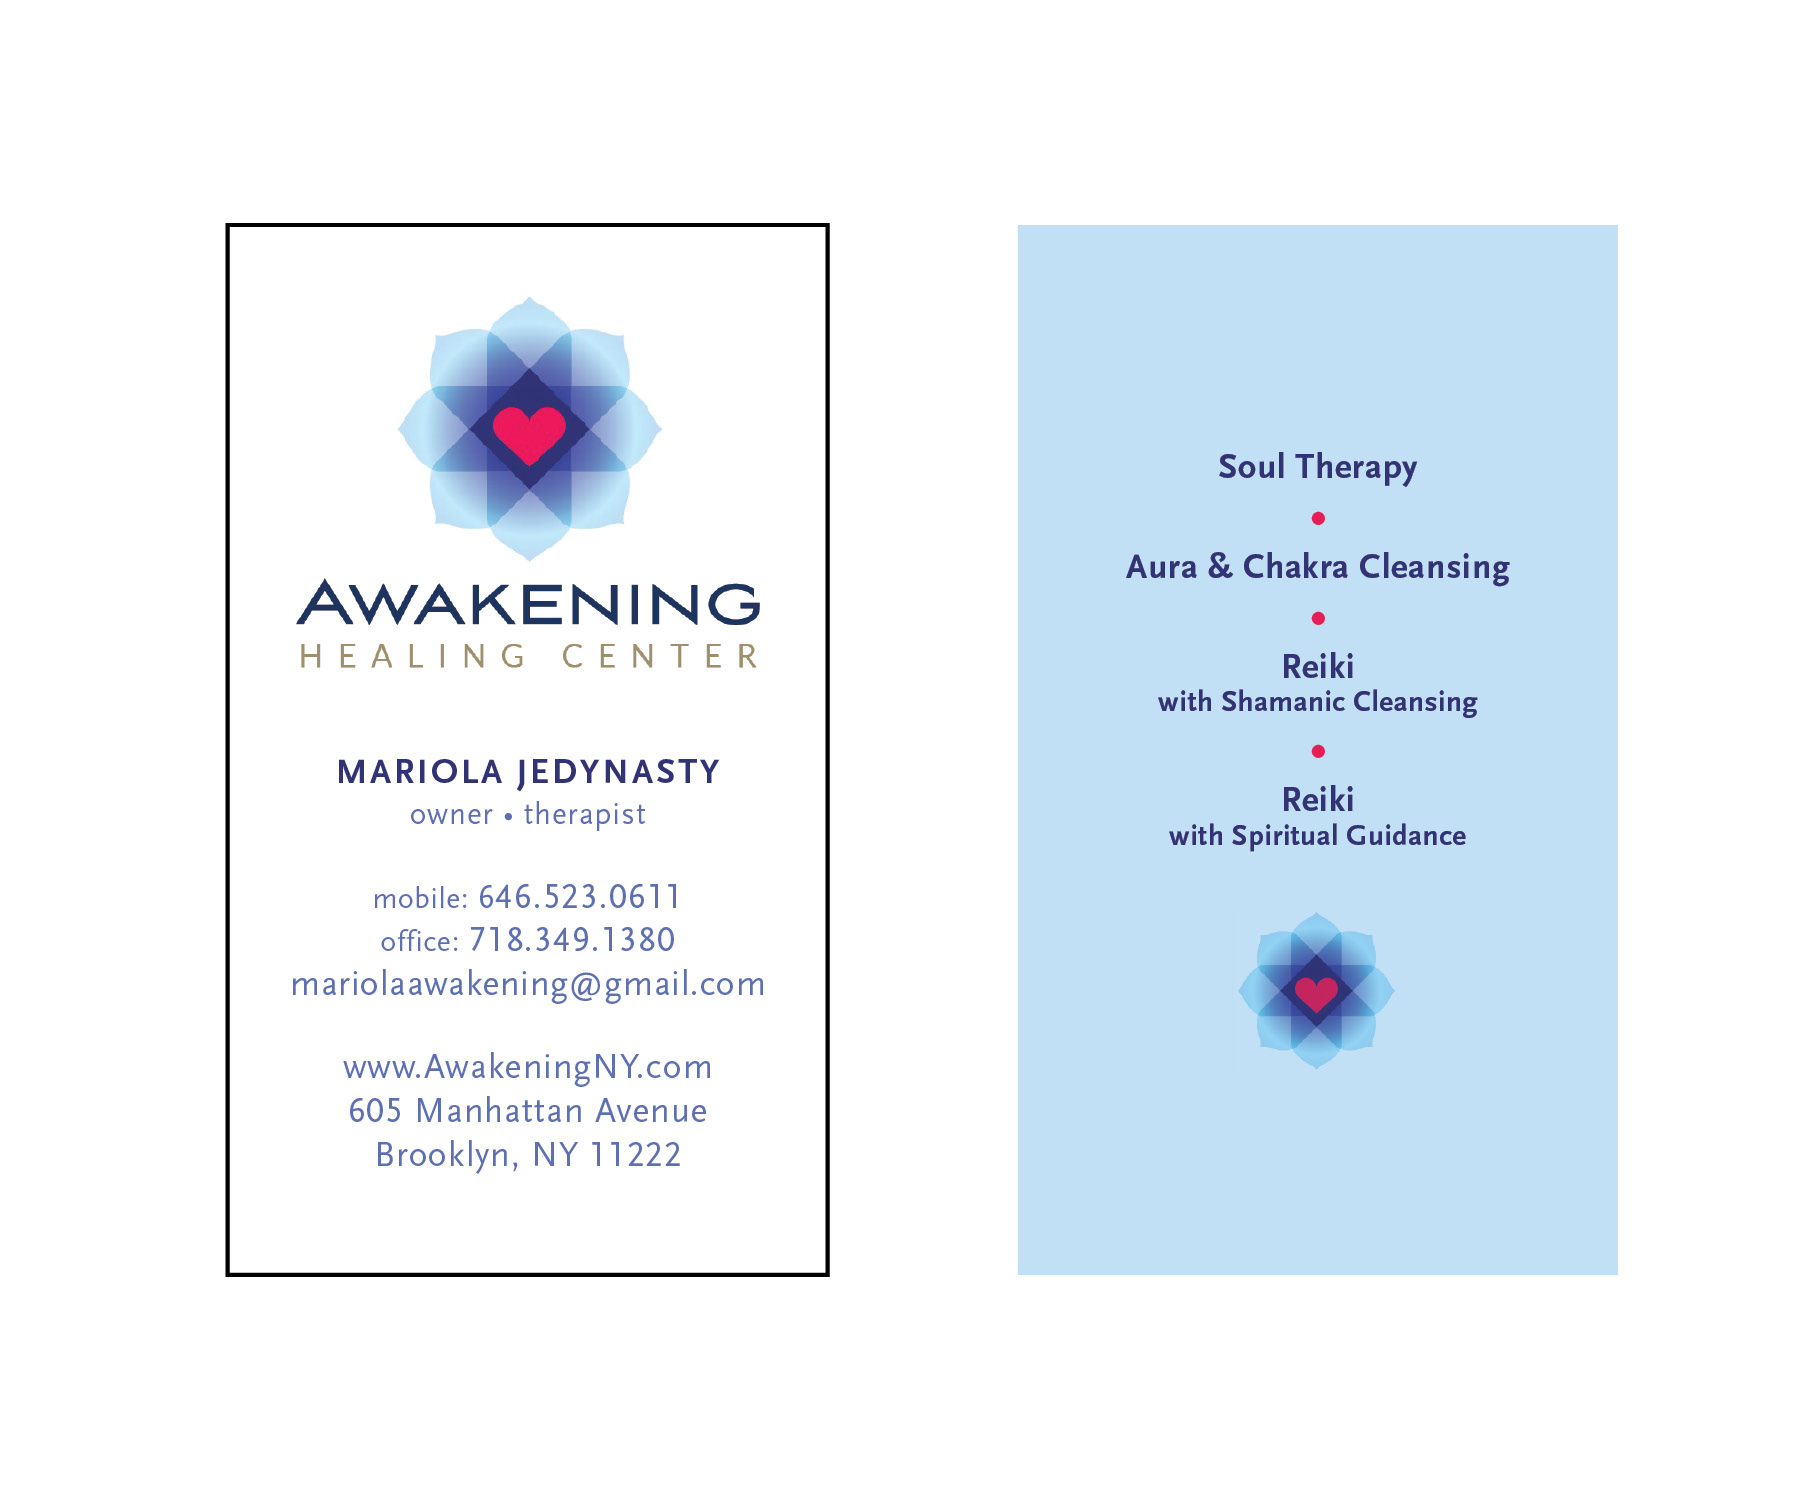 AwakeningCard.jpg